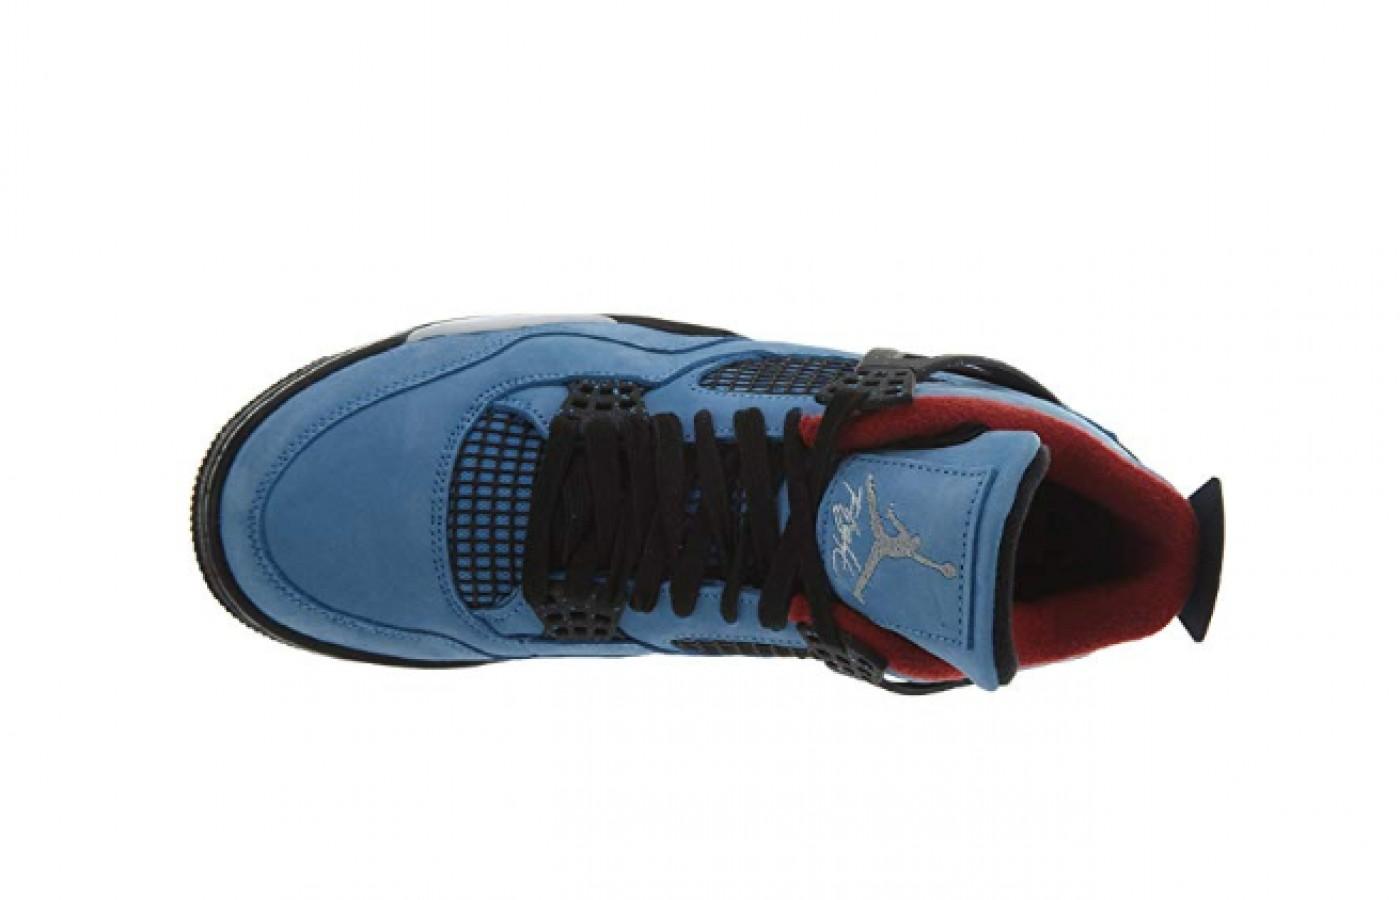 Jordan 4 Retro Travis Scott Cactus Jack Style Sneakers  left